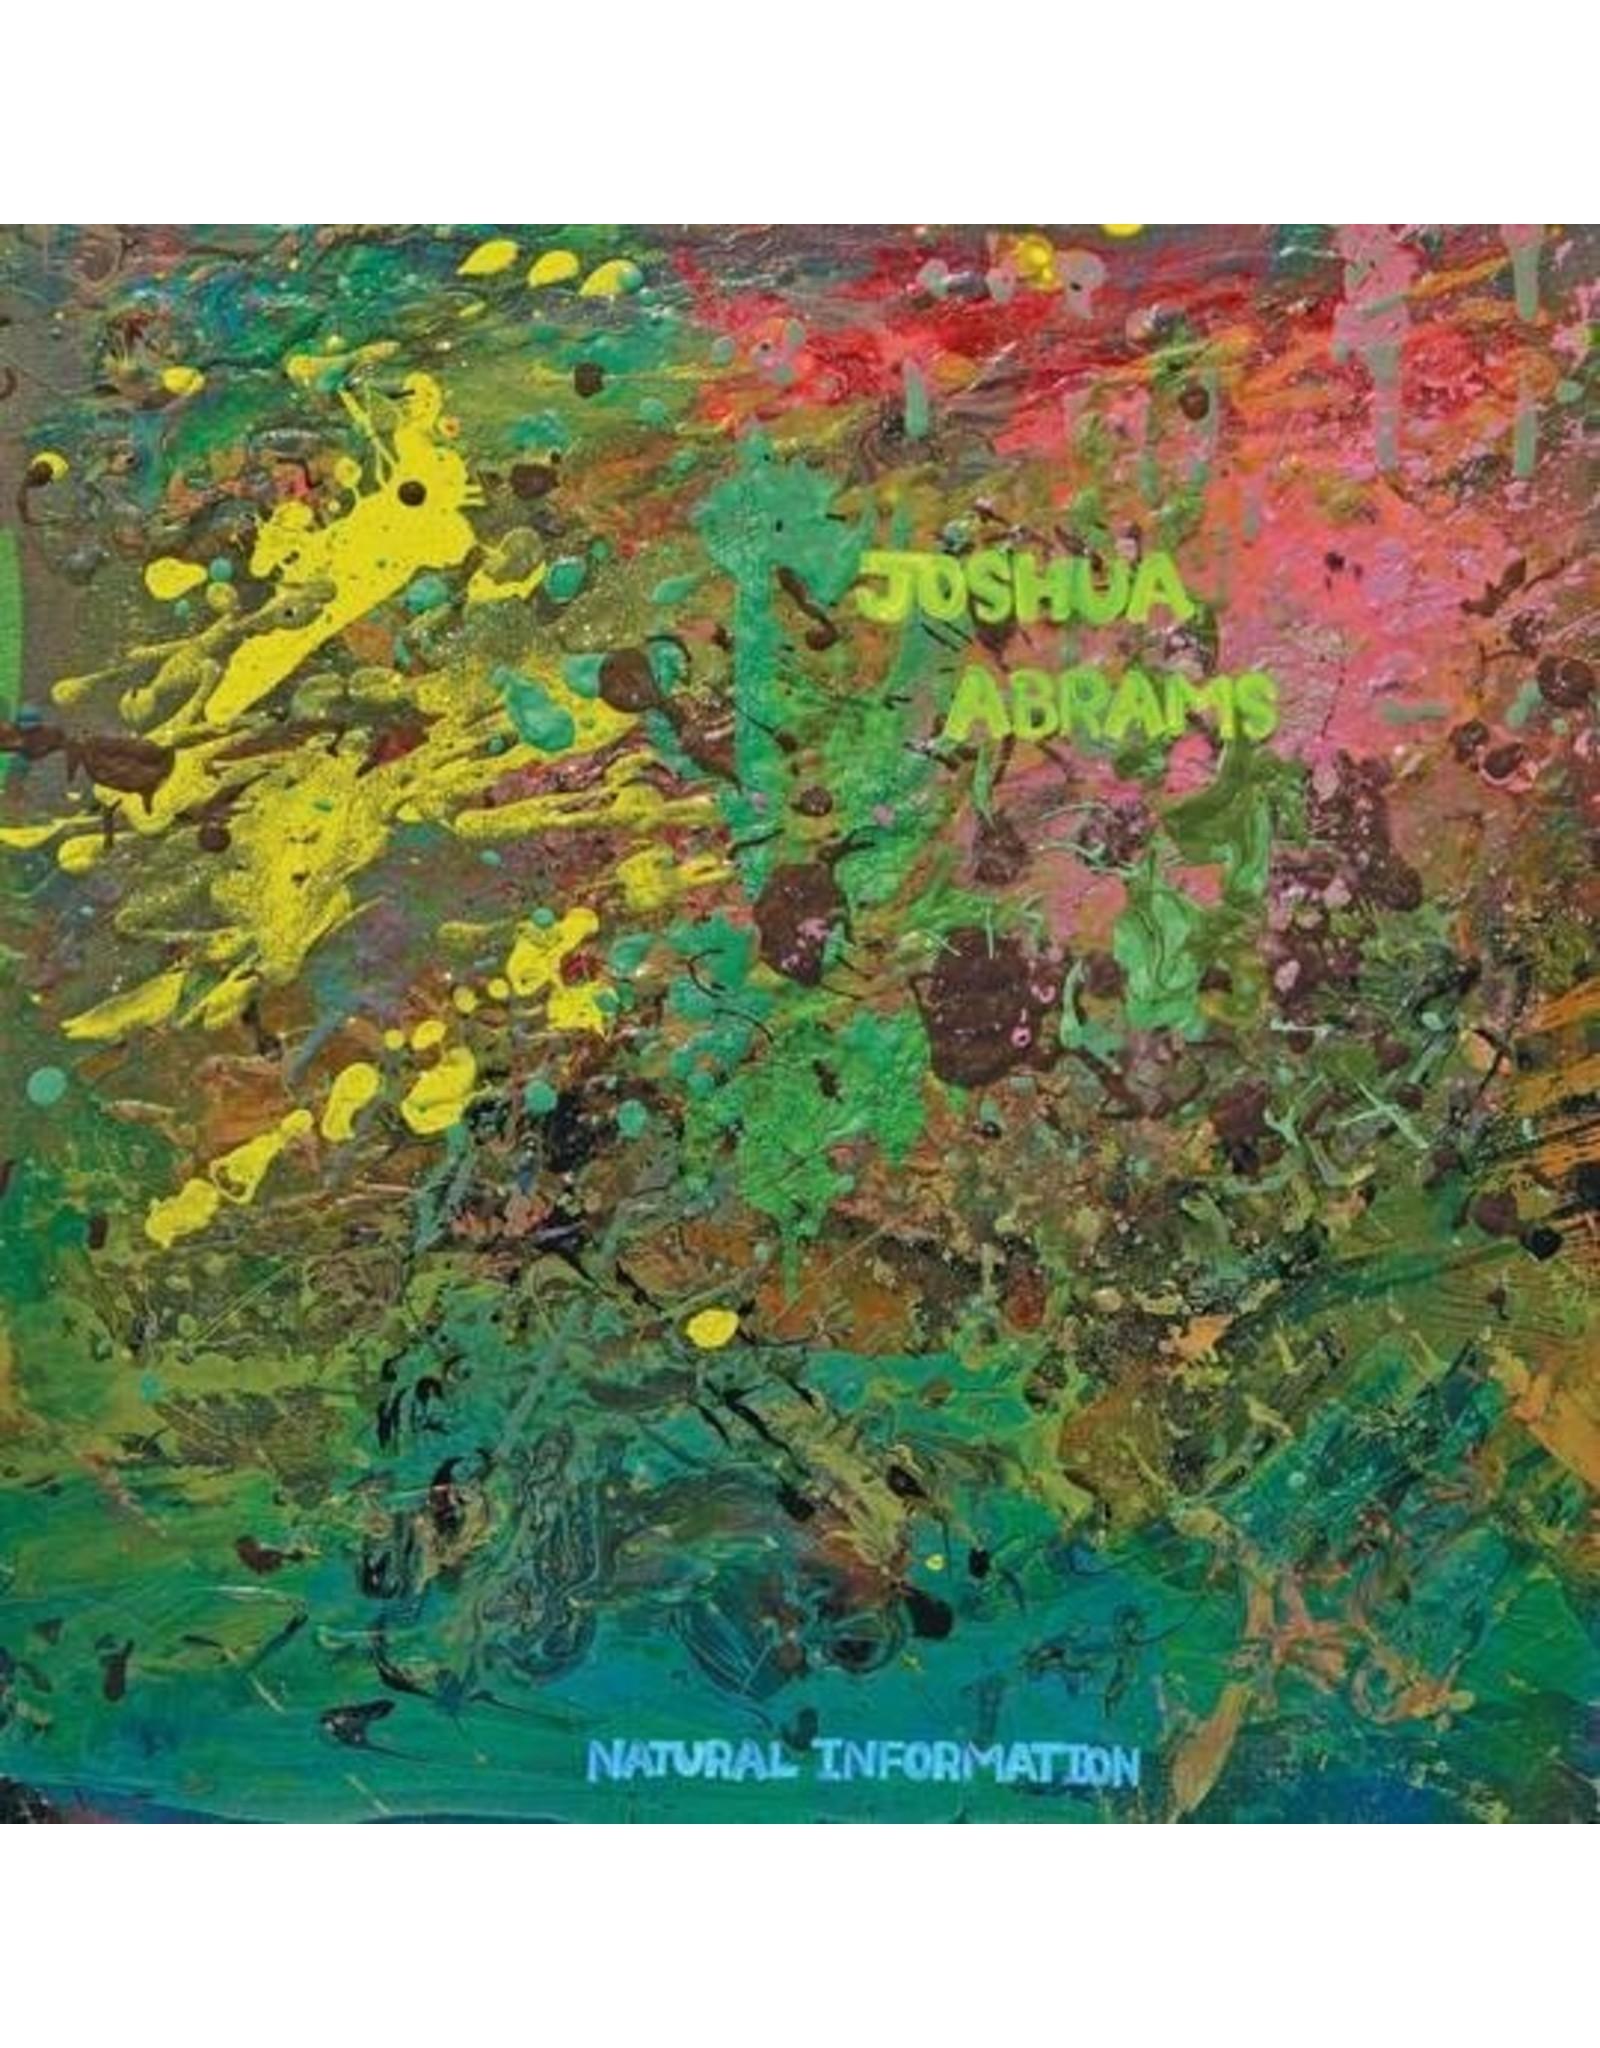 Aguirre Abrams, Joshua: Natural Information LP